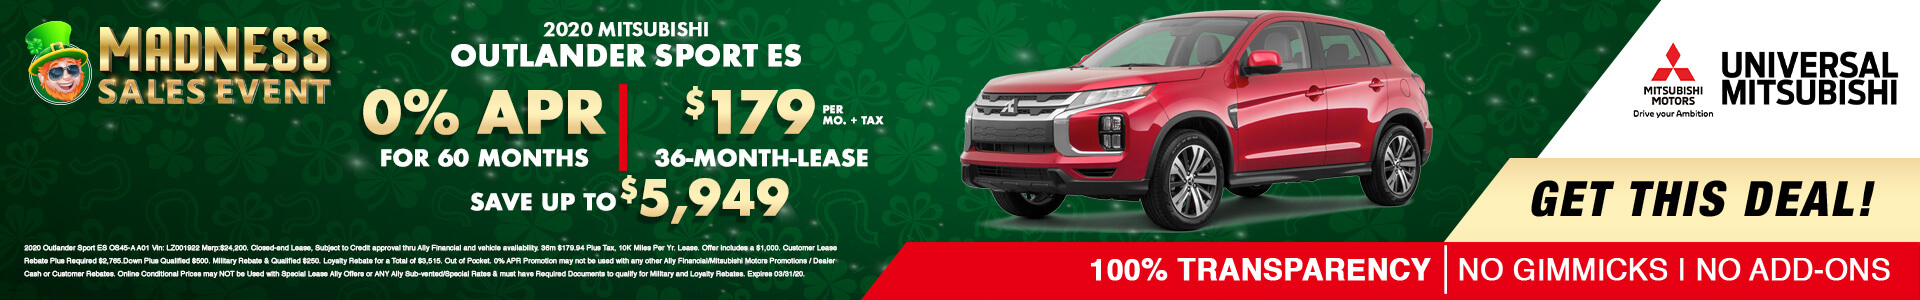 Mitsubishi Outlander Sport $16745